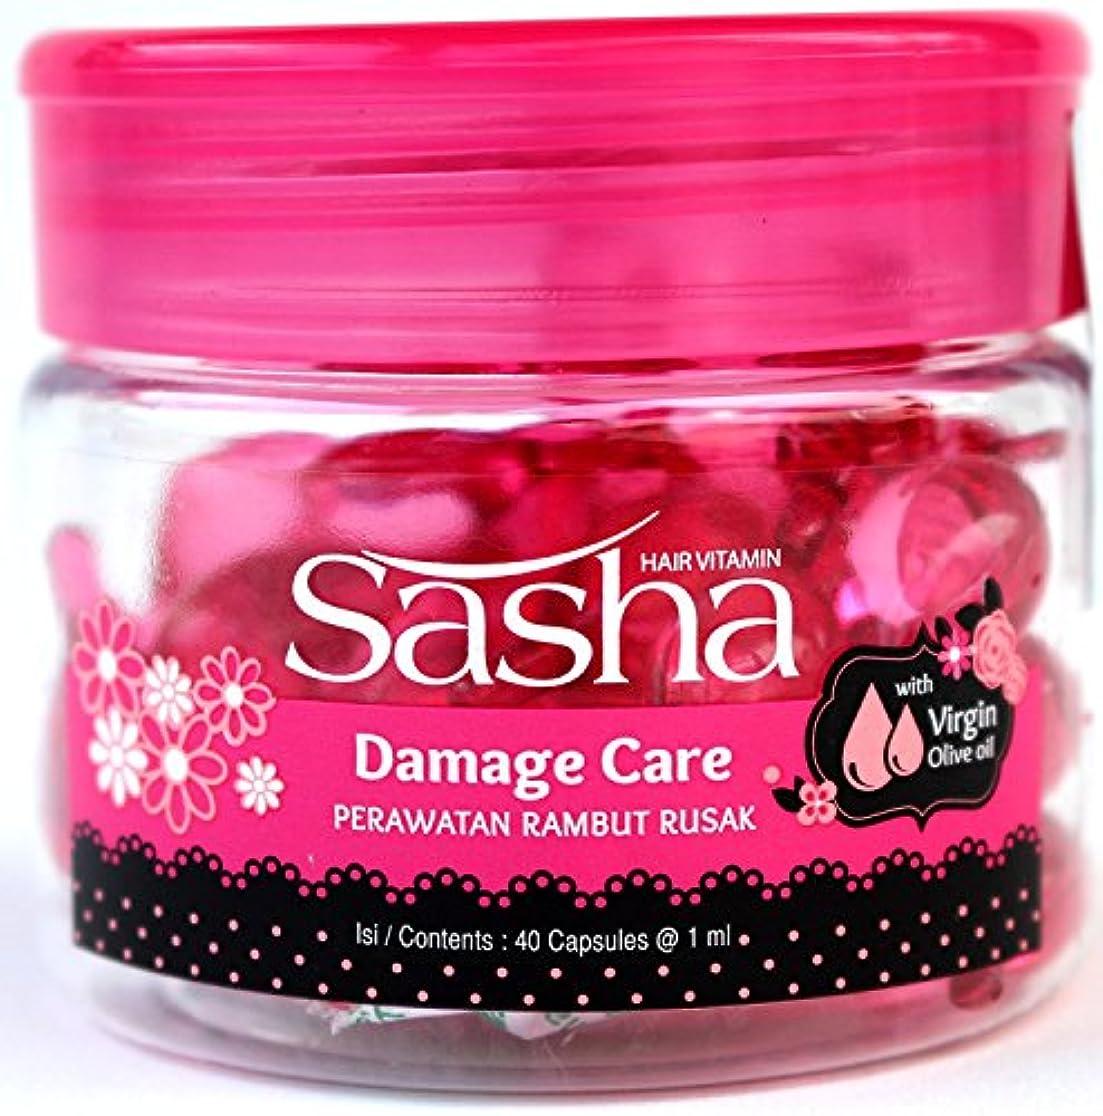 Sasha(サシャ)ヘアビタミン(40粒入) [並行輸入品][海外直送品]